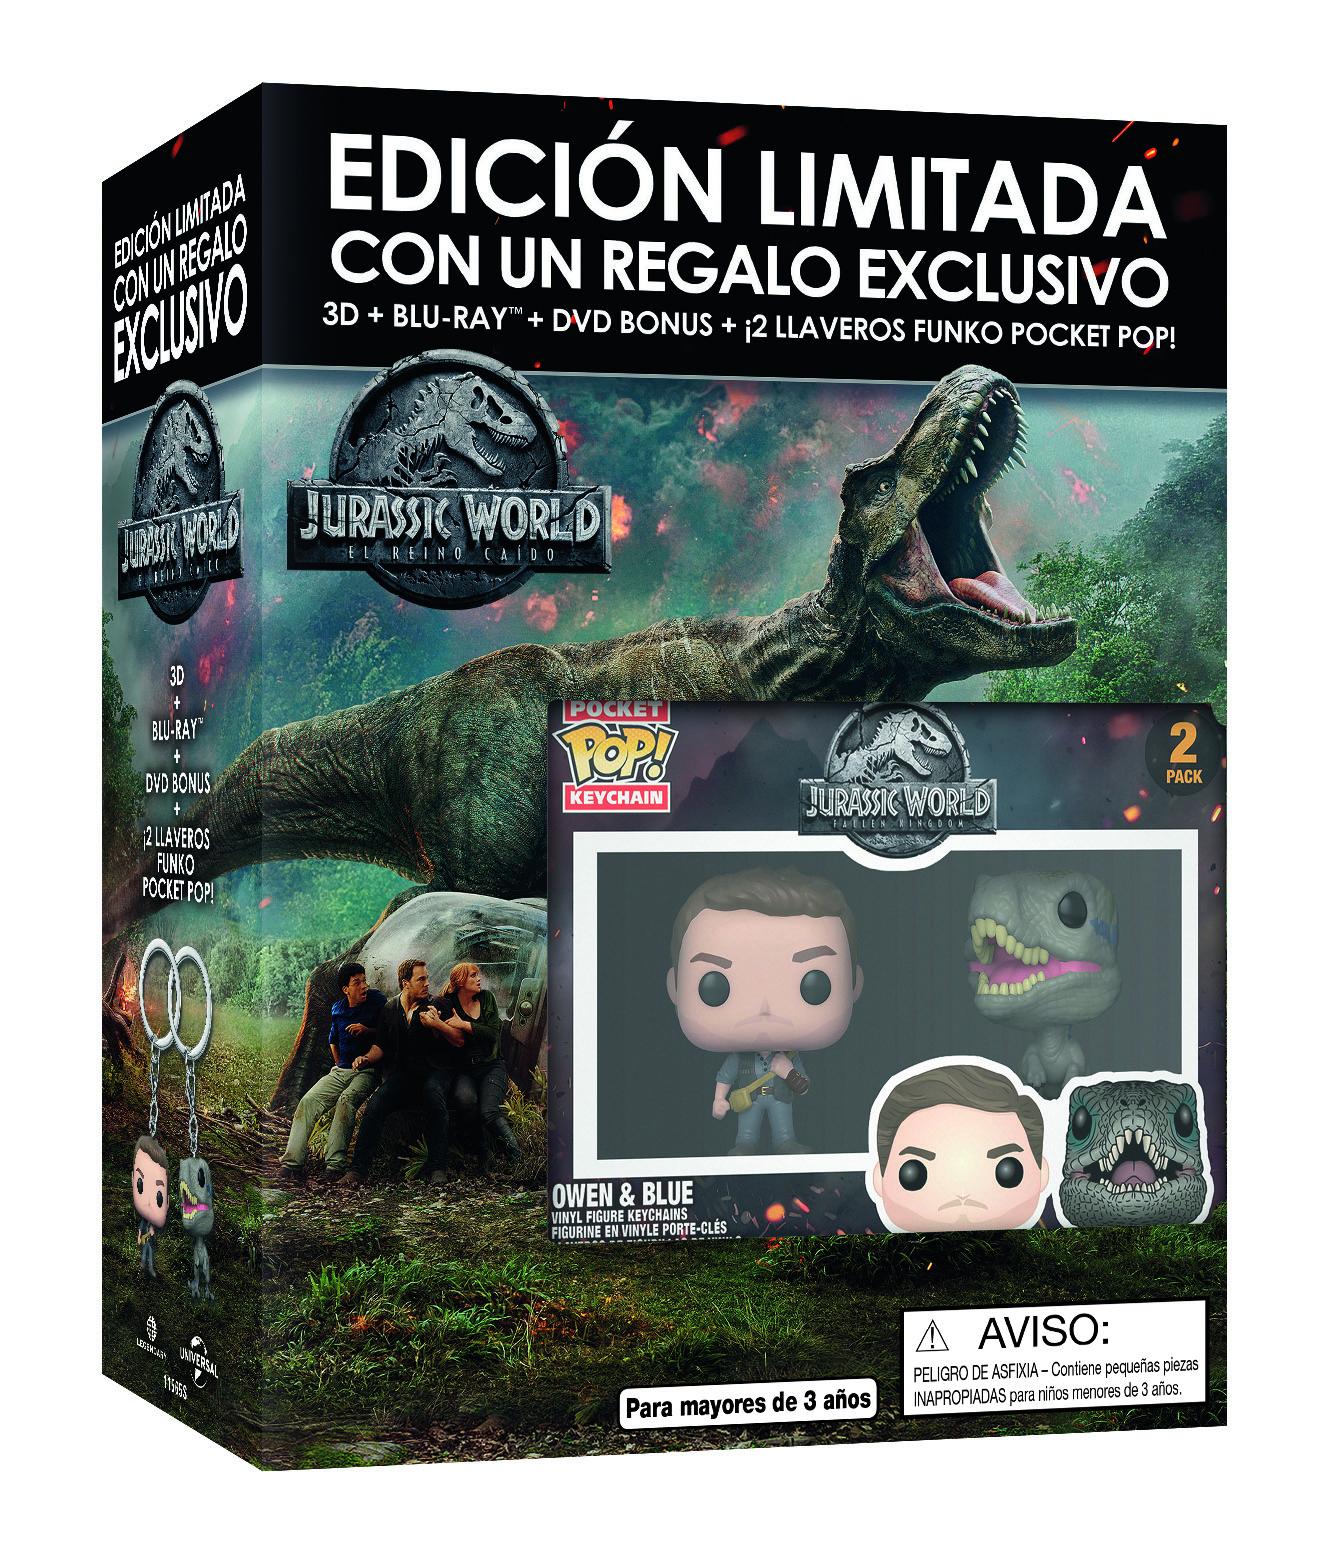 Jurassic World: El Reino Caído Funko 3D y 2D